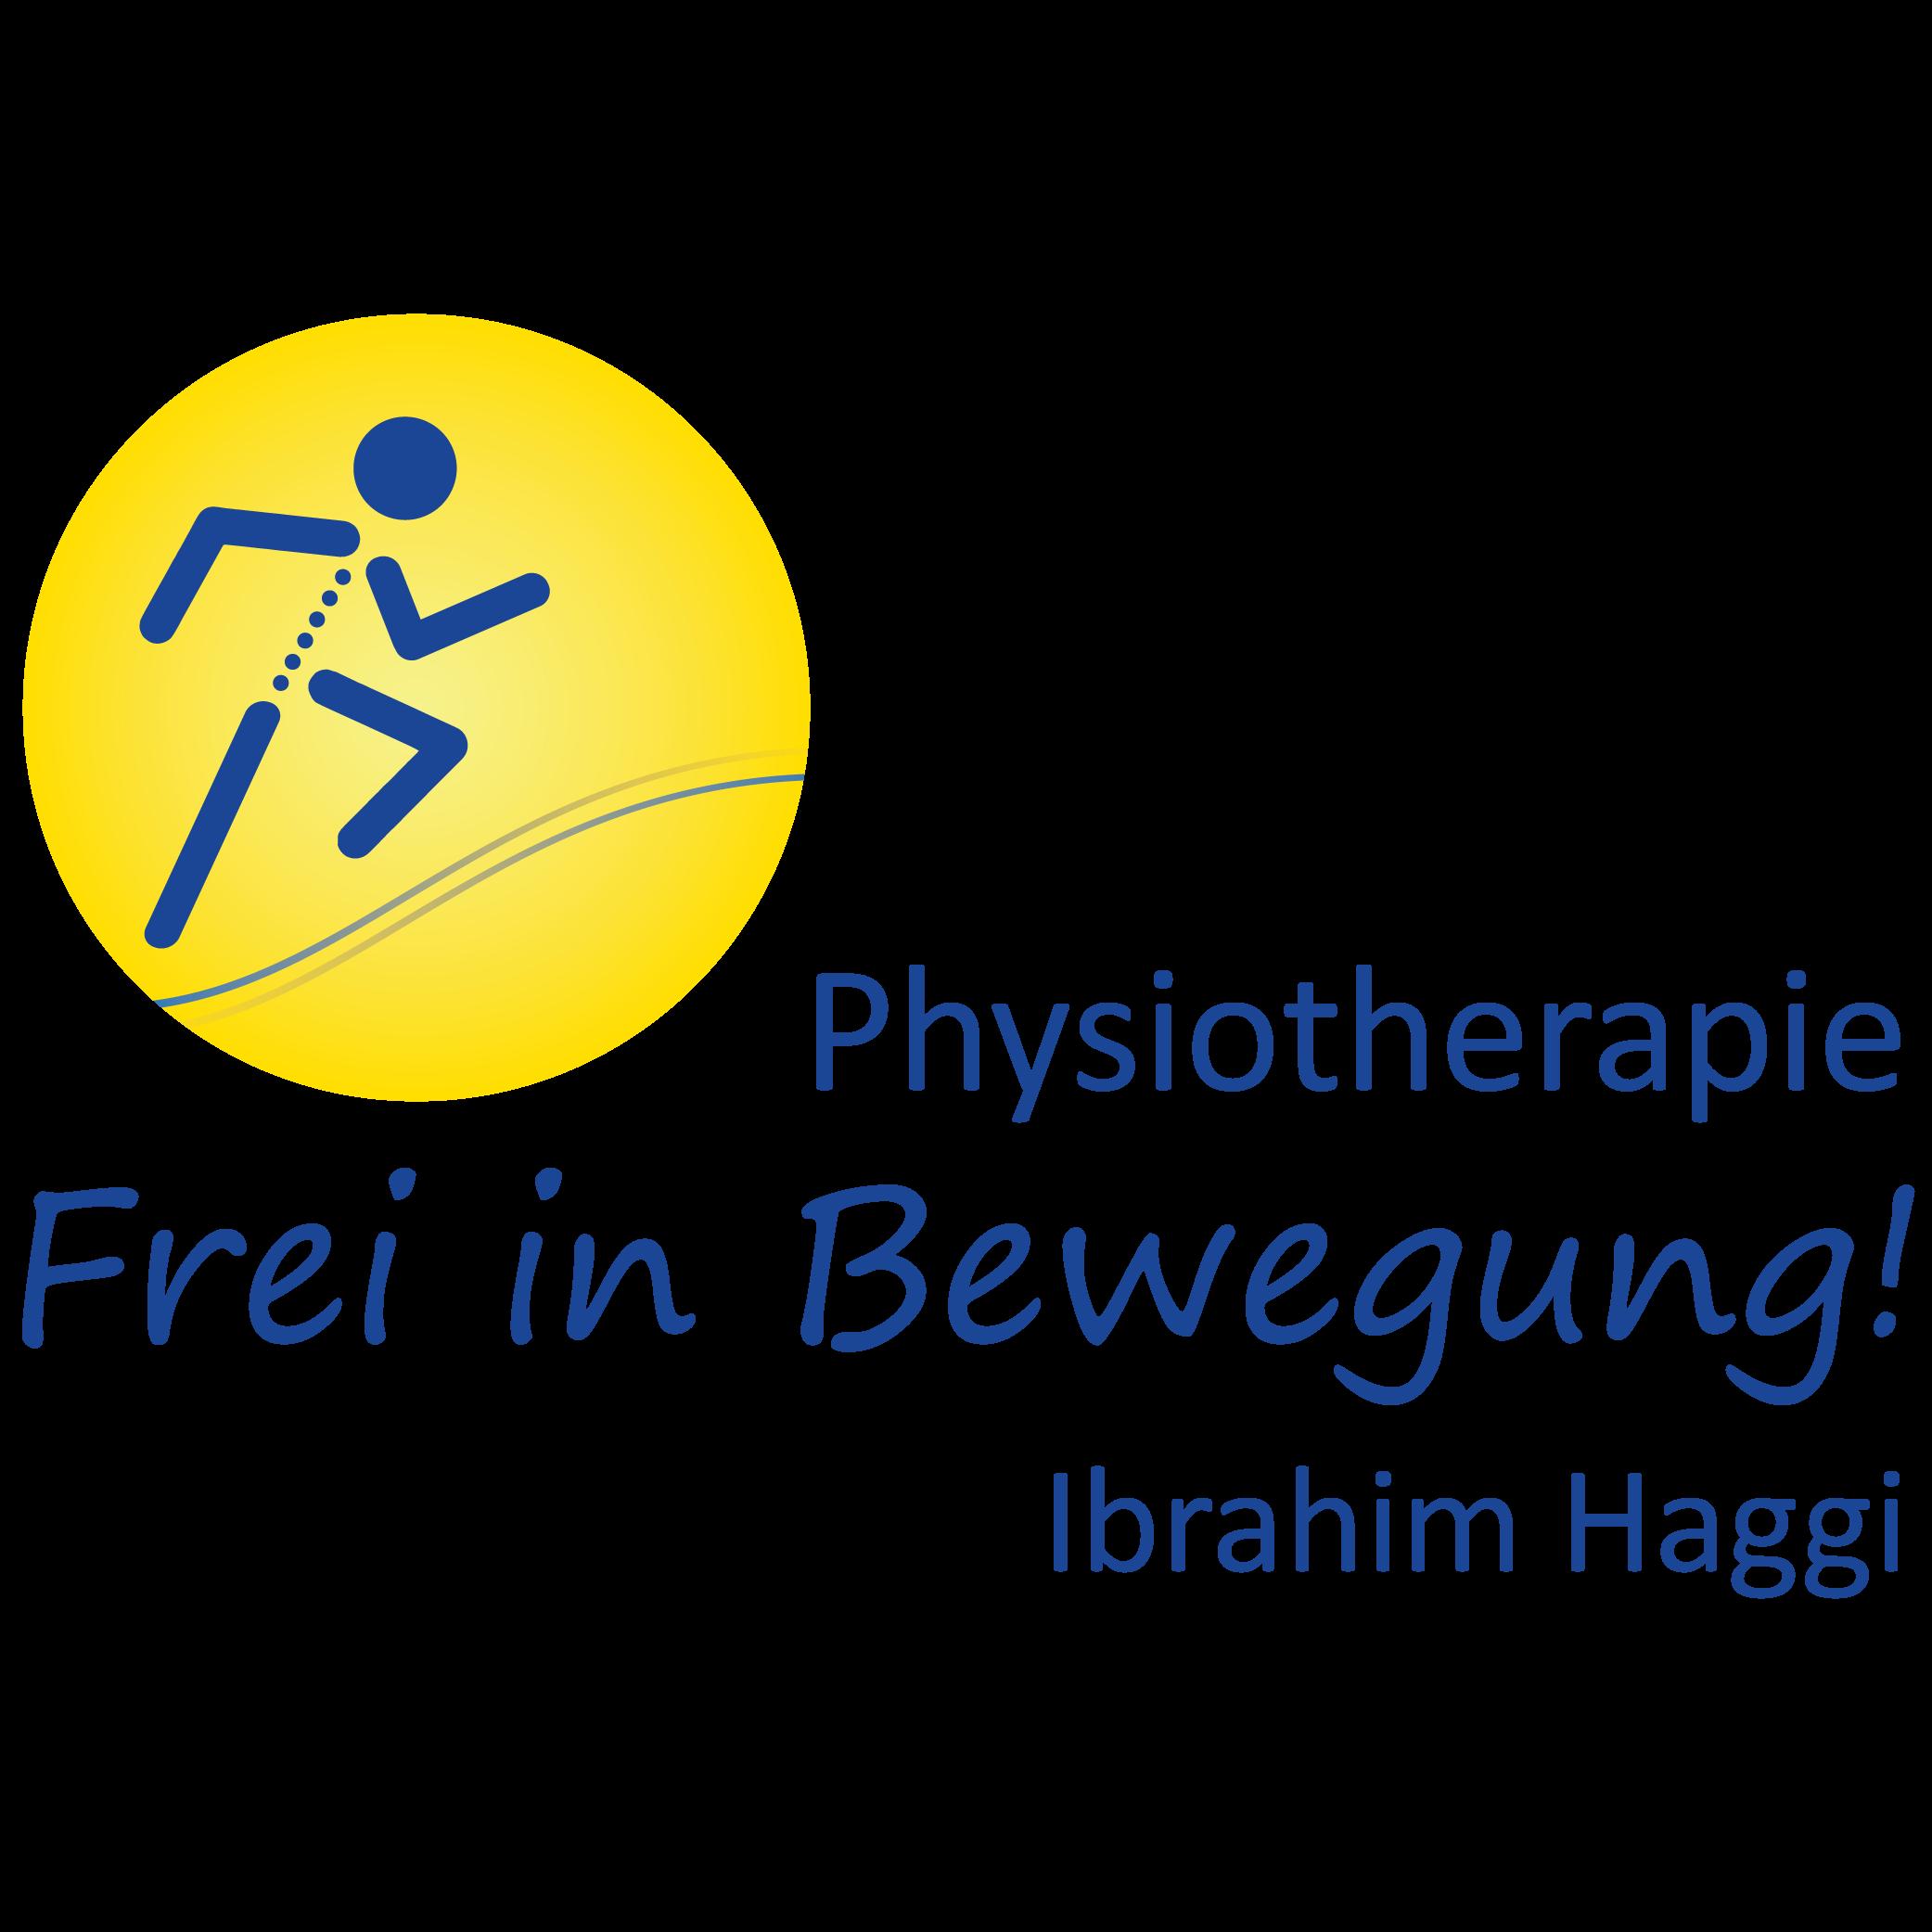 Logo Physiotherapie Frei in Bewegung!